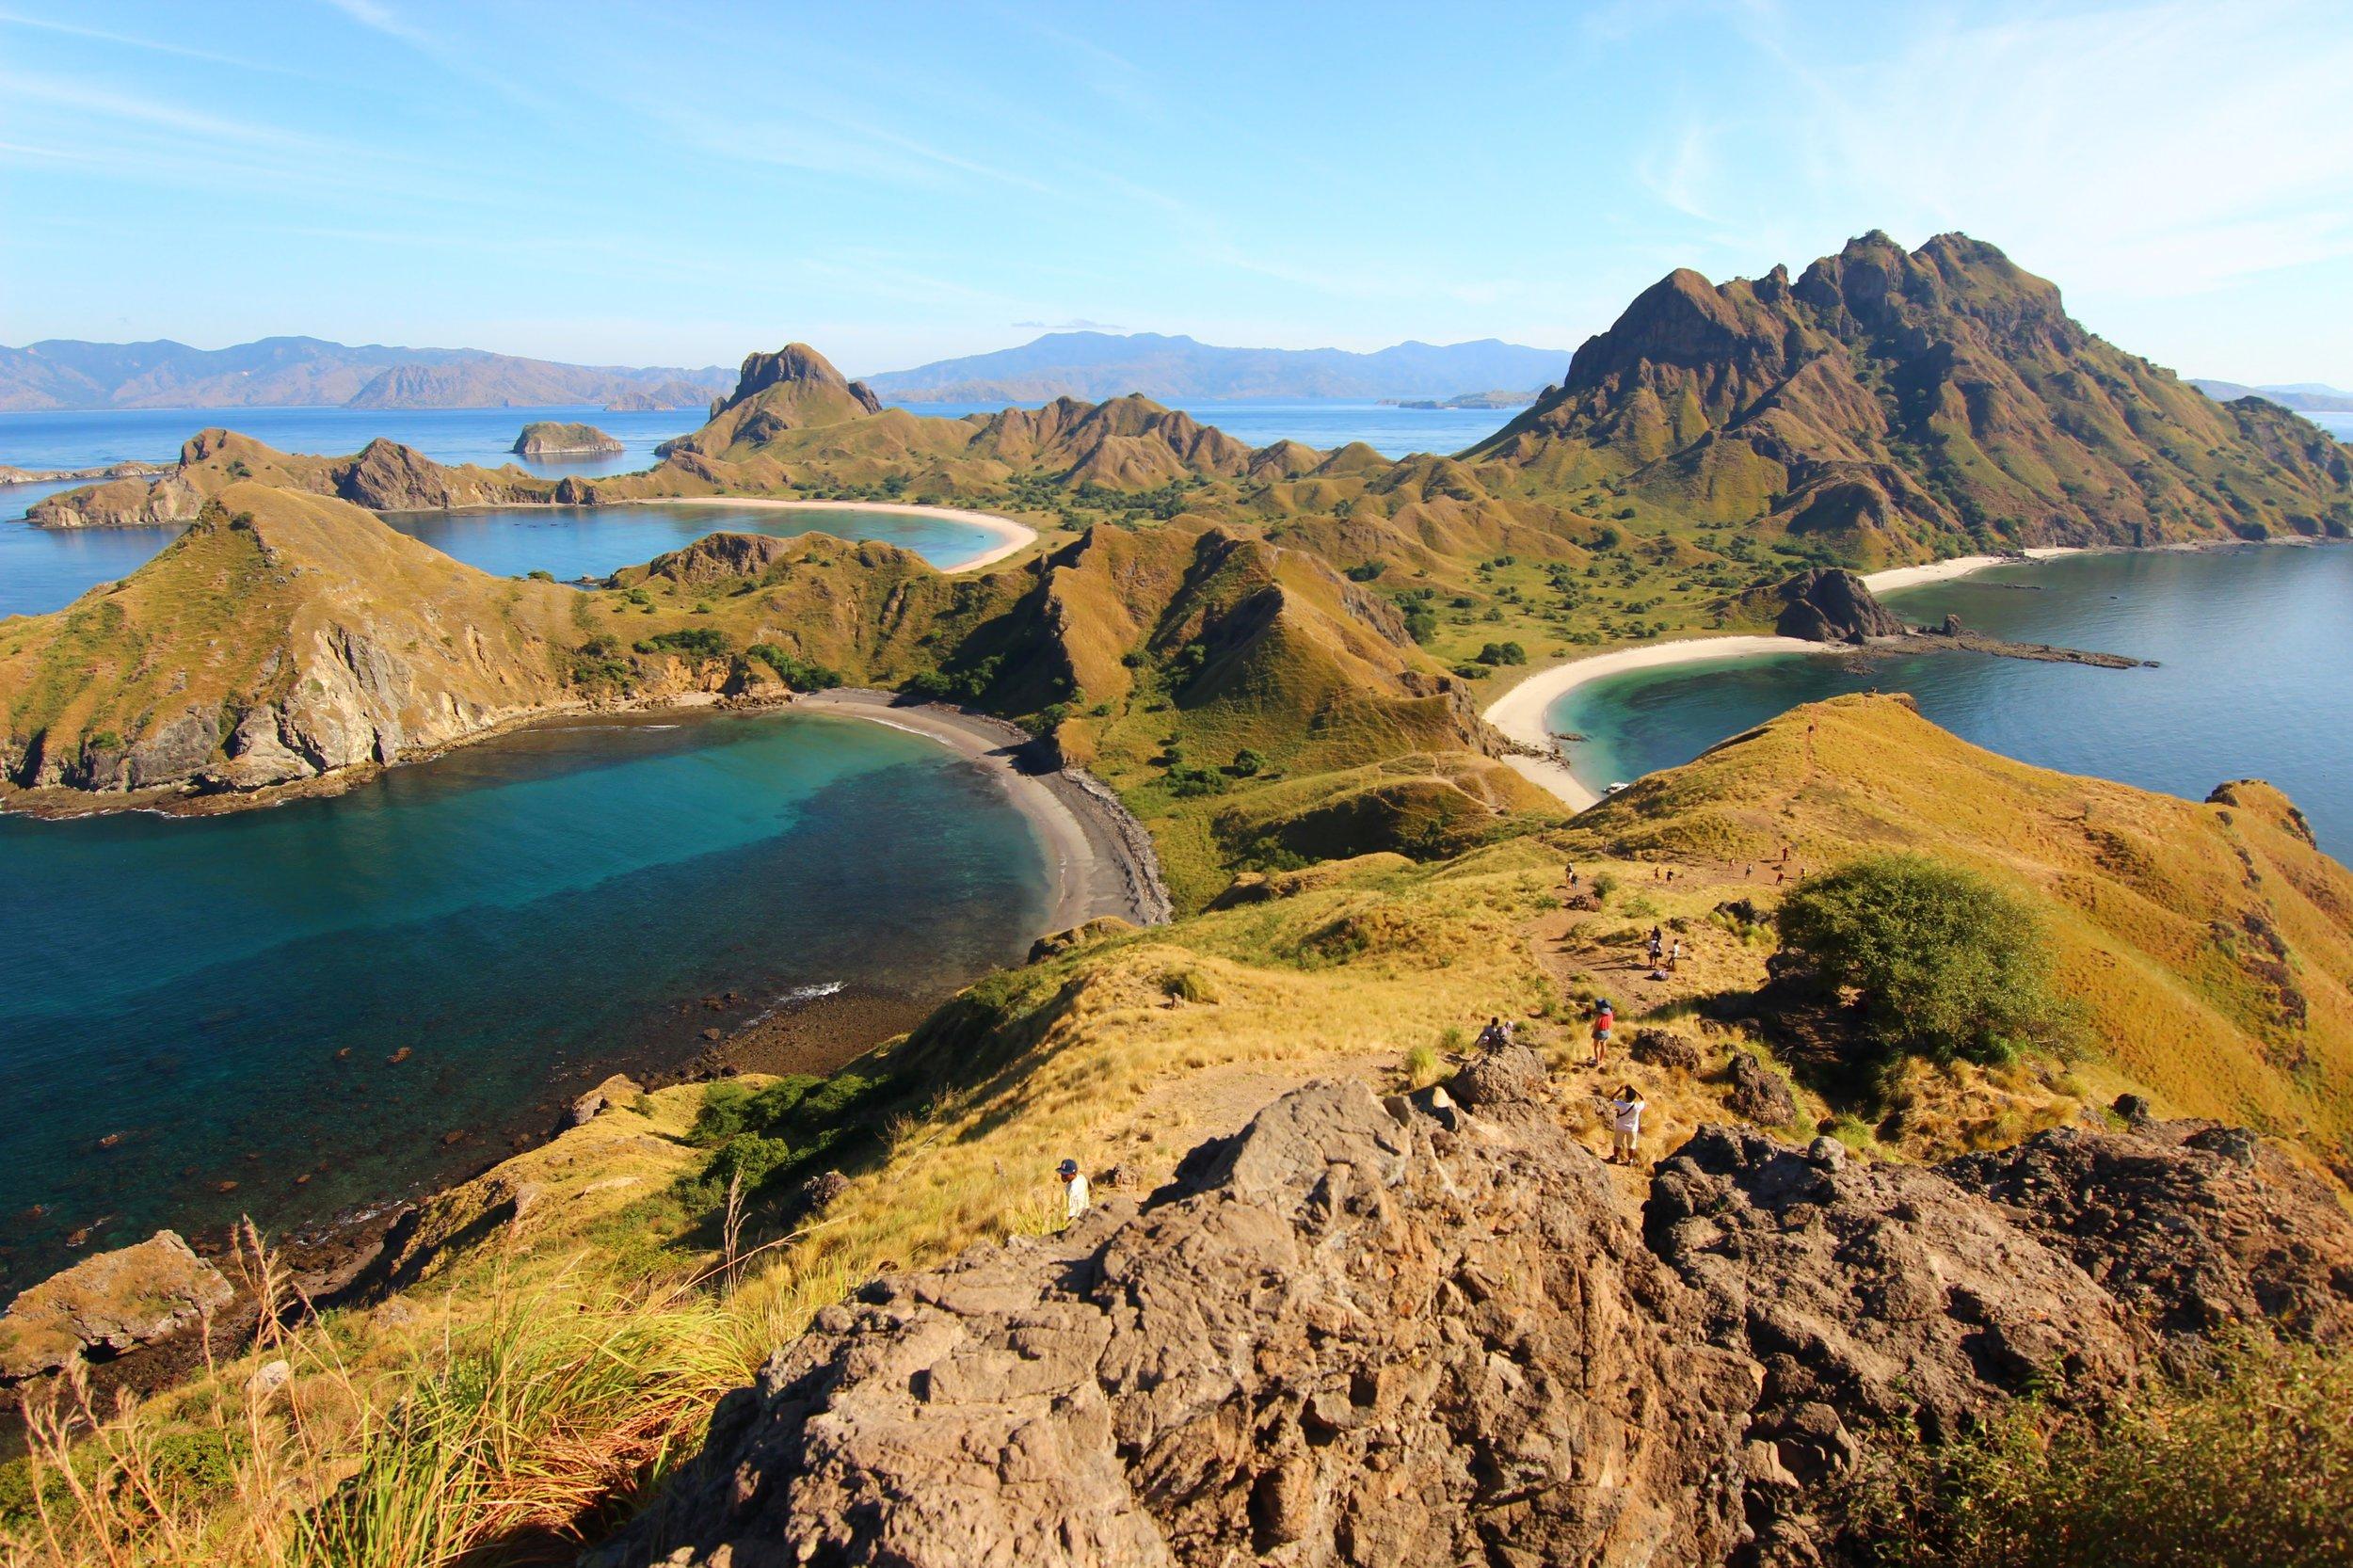 cruising: komodo national park -